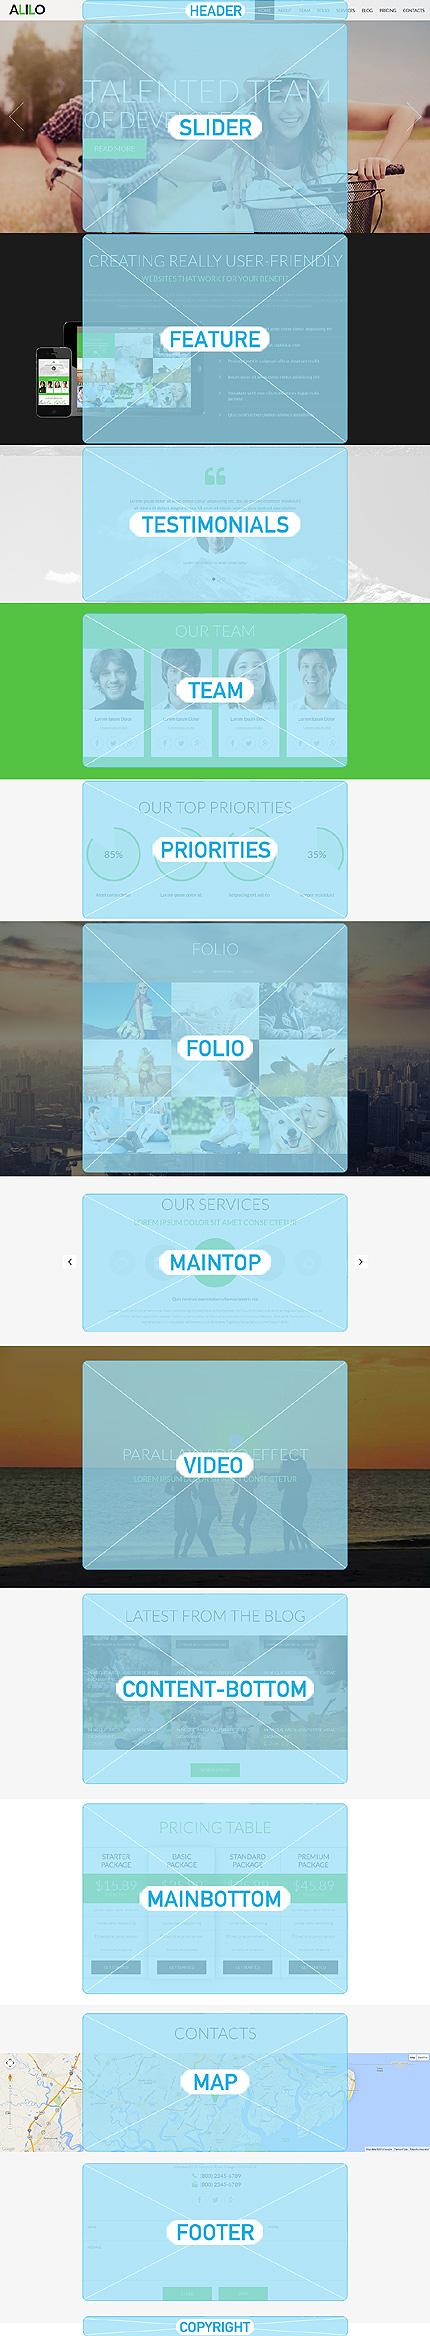 Joomla Theme/Template 51148 Main Page Screenshot